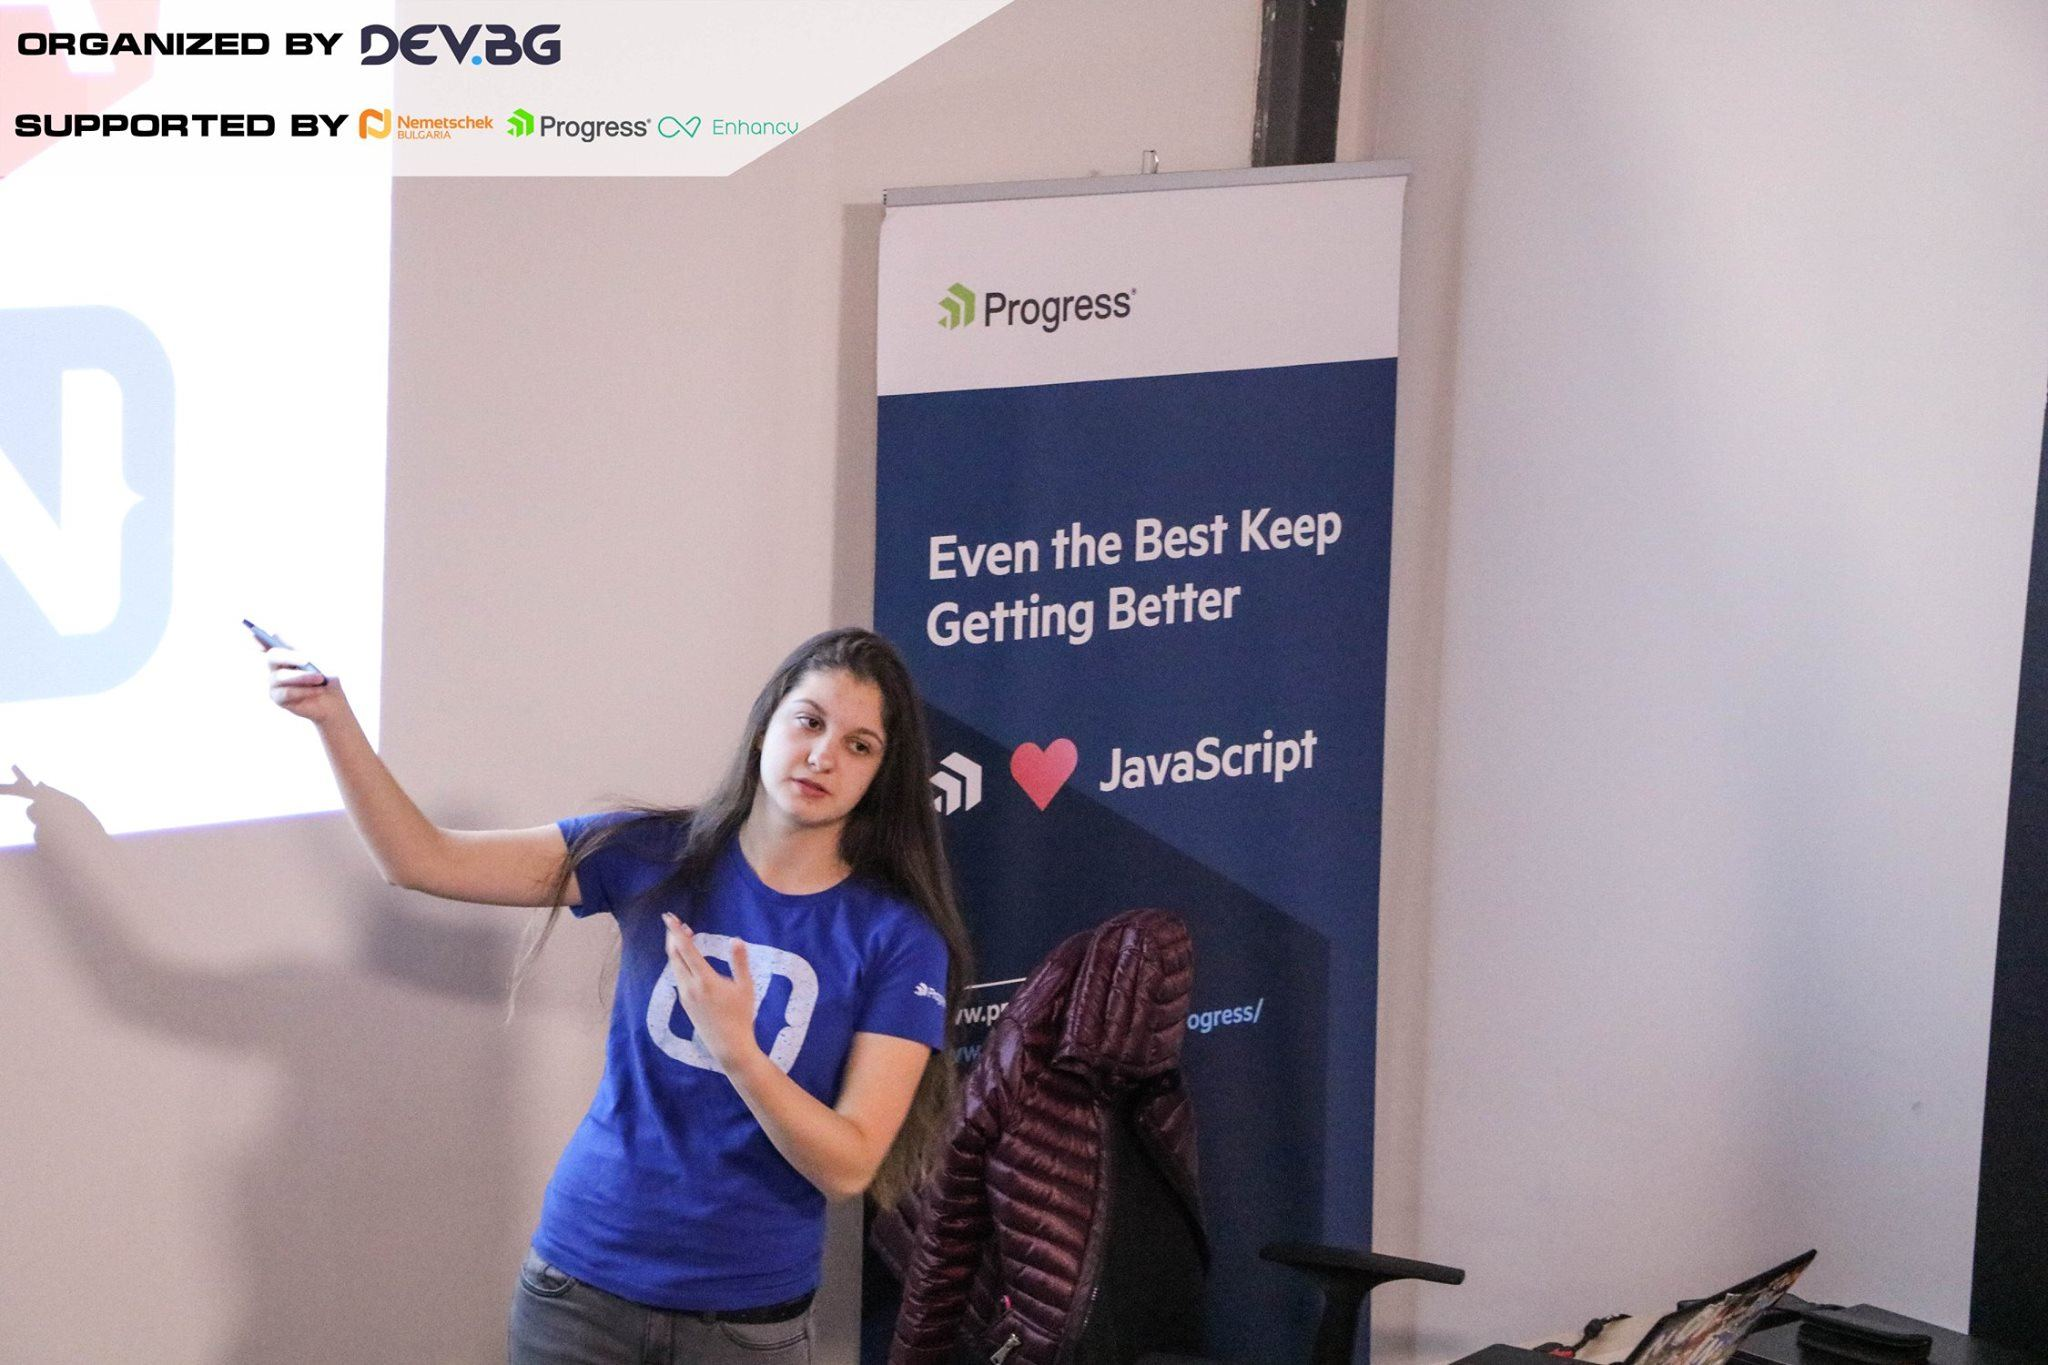 Progress Supports Dev BG-2